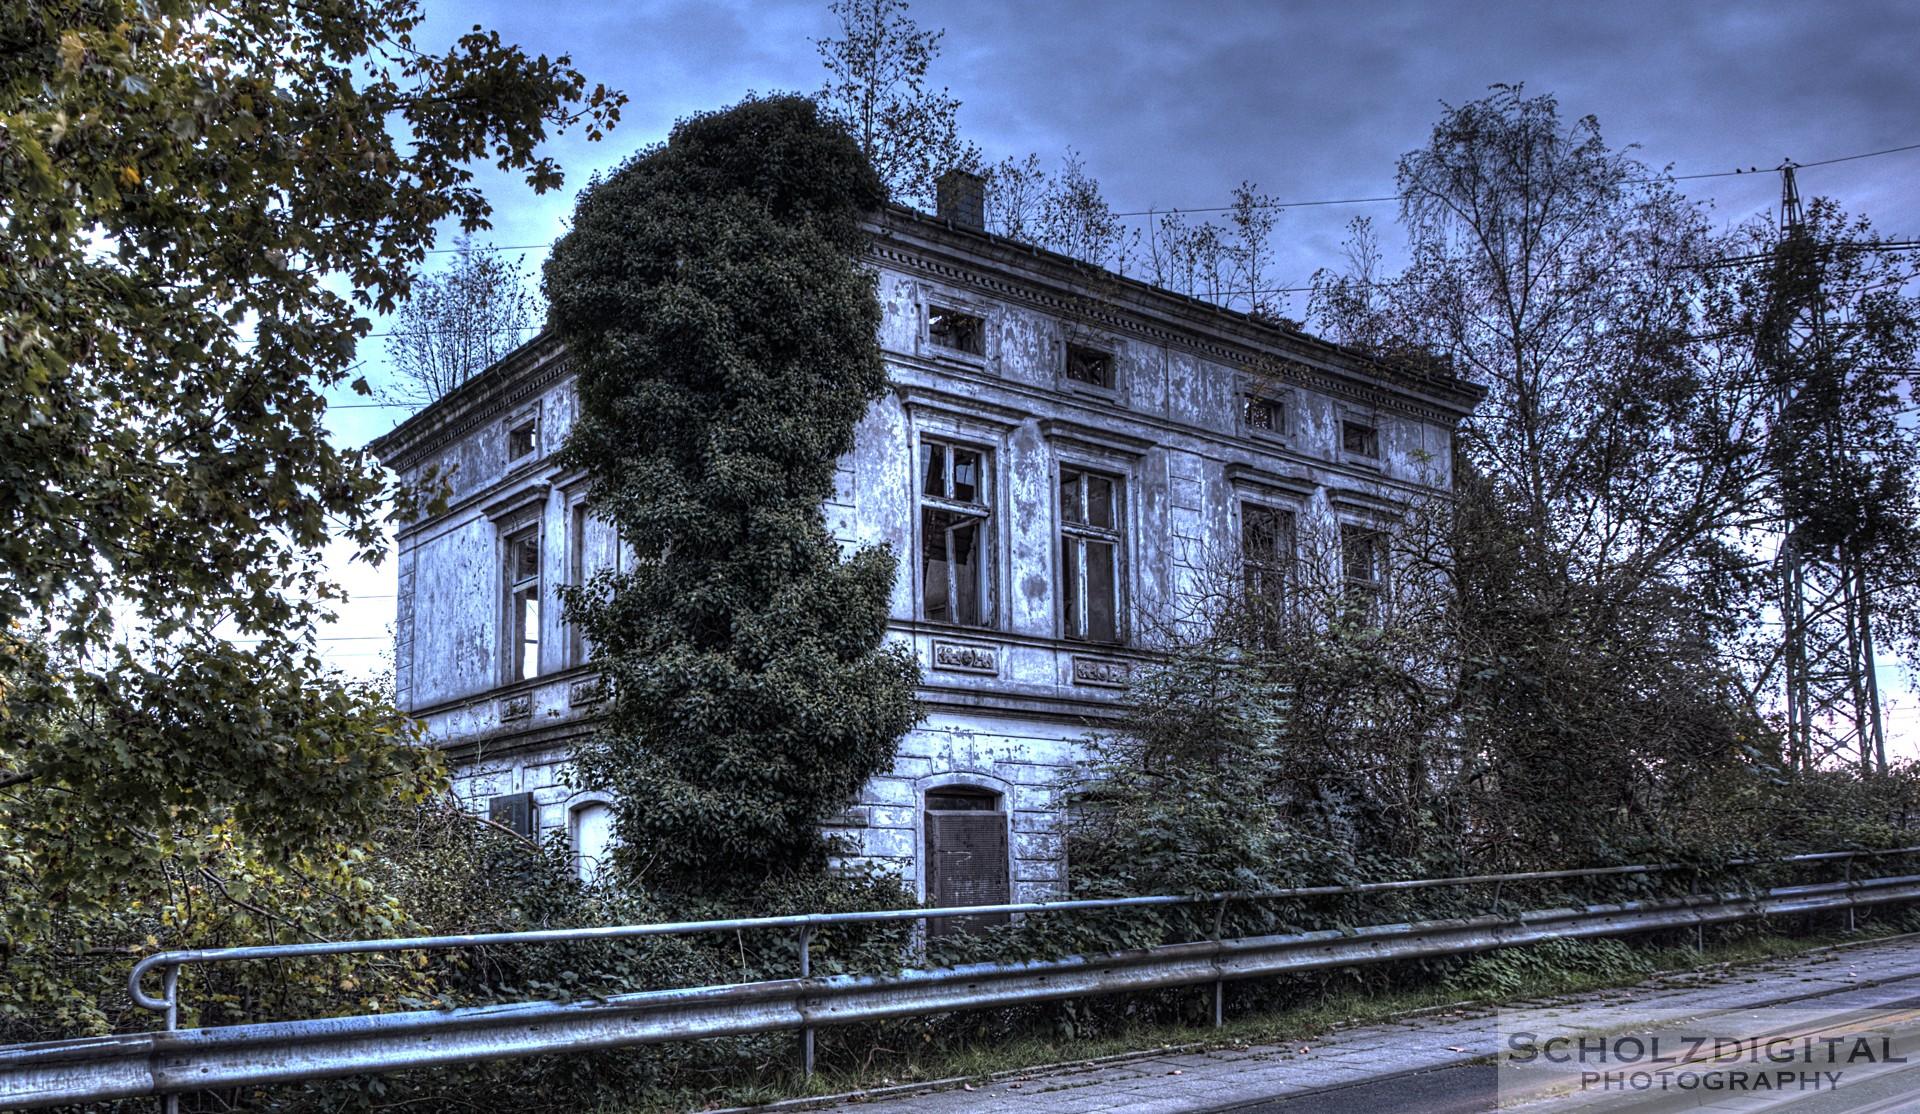 lost places wohnhaus im ruhrgebiet in nrw scholzdigital photography urban exploration. Black Bedroom Furniture Sets. Home Design Ideas